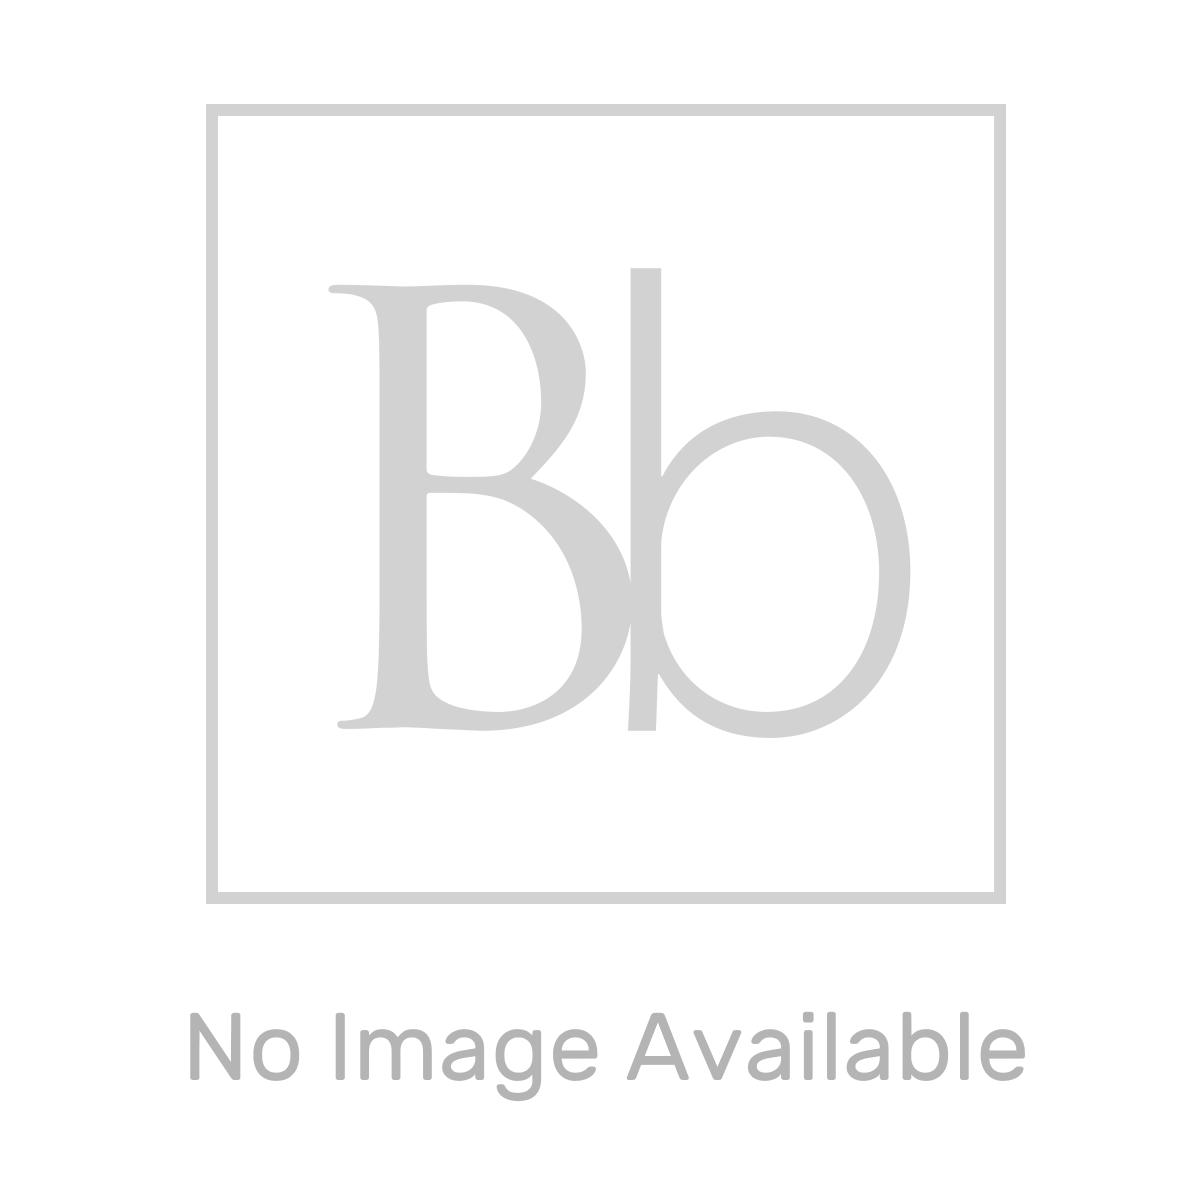 Elation Combination L Shape Bodega Grey Furniture Suite with Left Hand L Shape Shower Bath